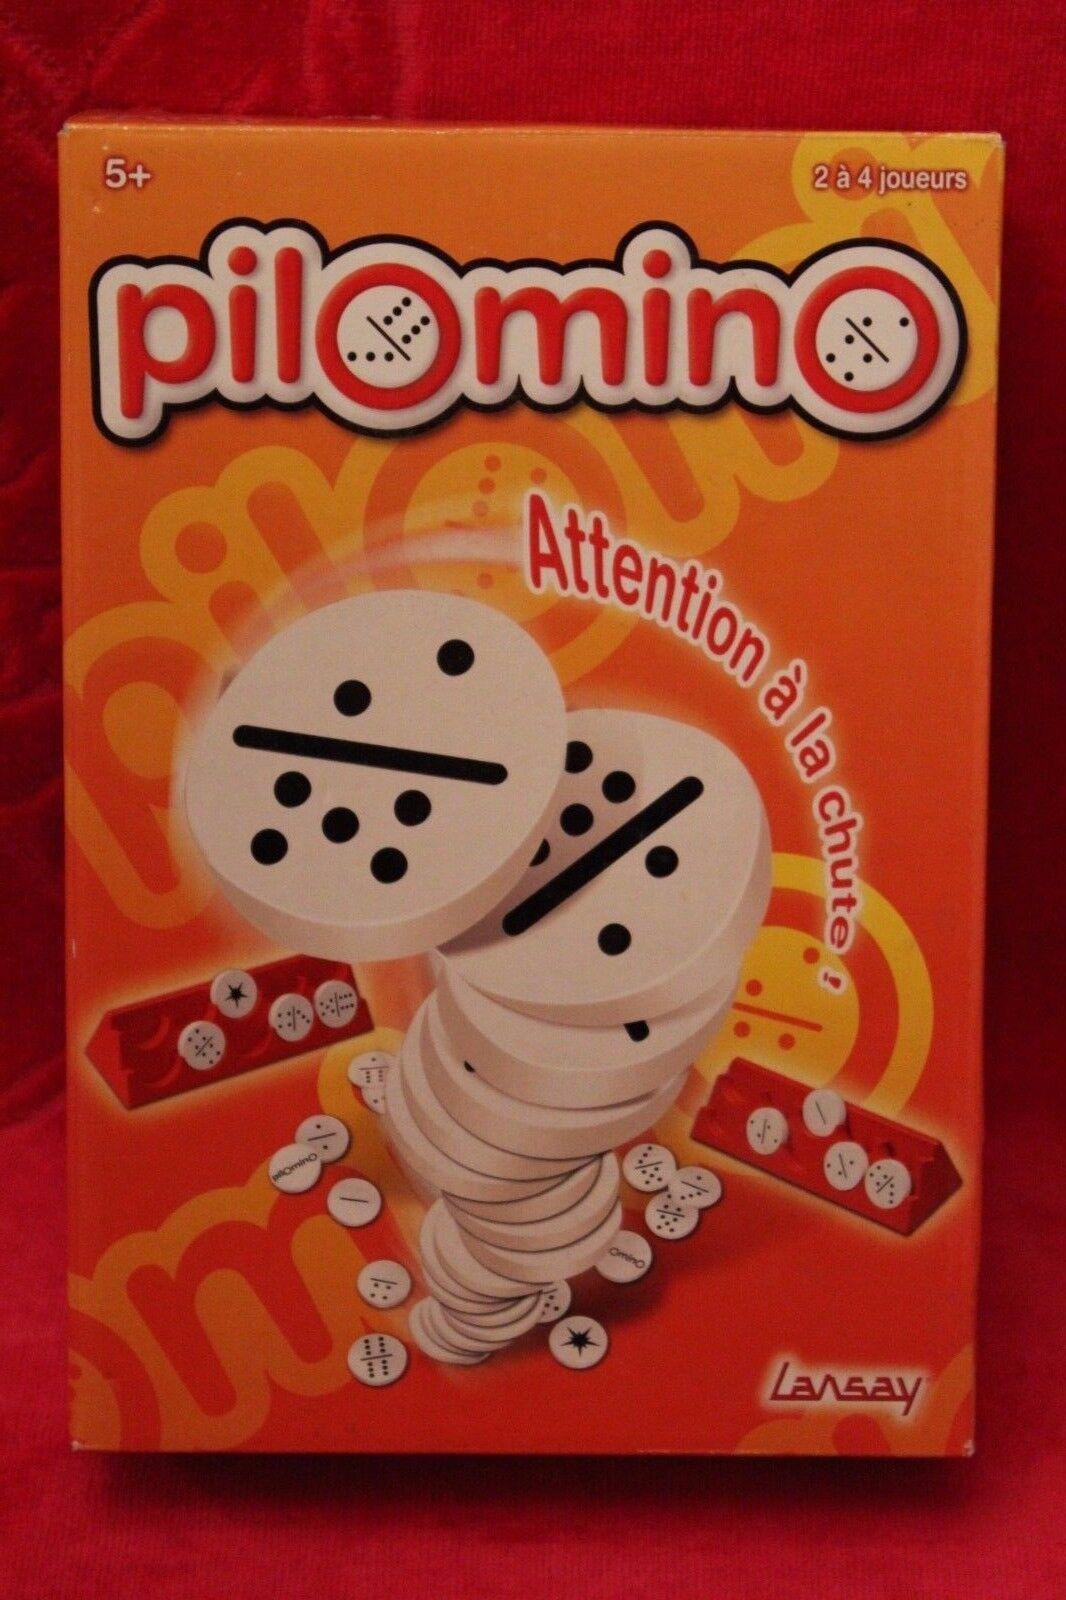 RARE   Jeu de société Pilomino - occasion complet - Domino rond